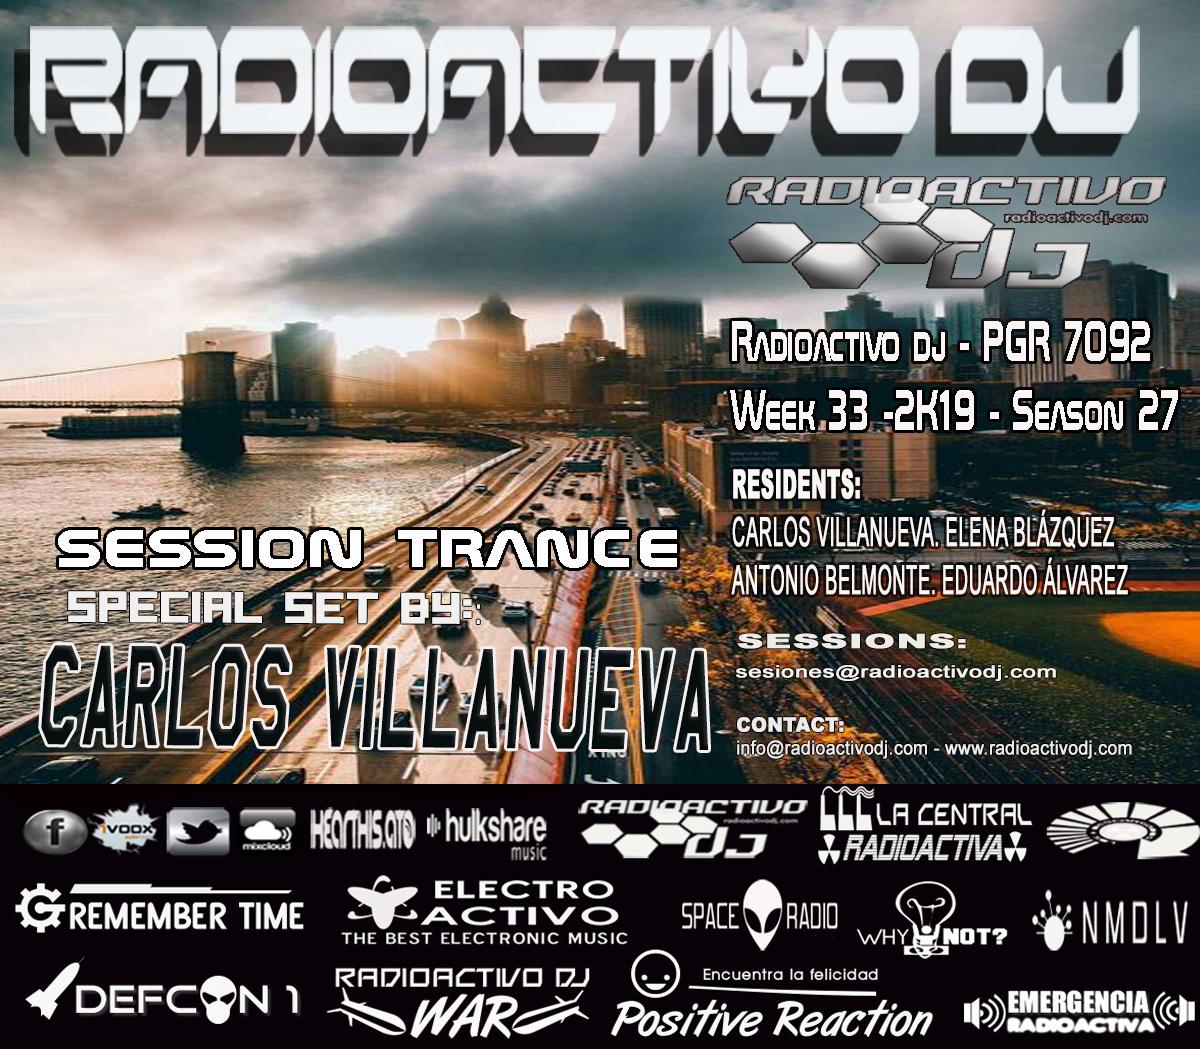 RADIOACTIVO-DJ-33-2019